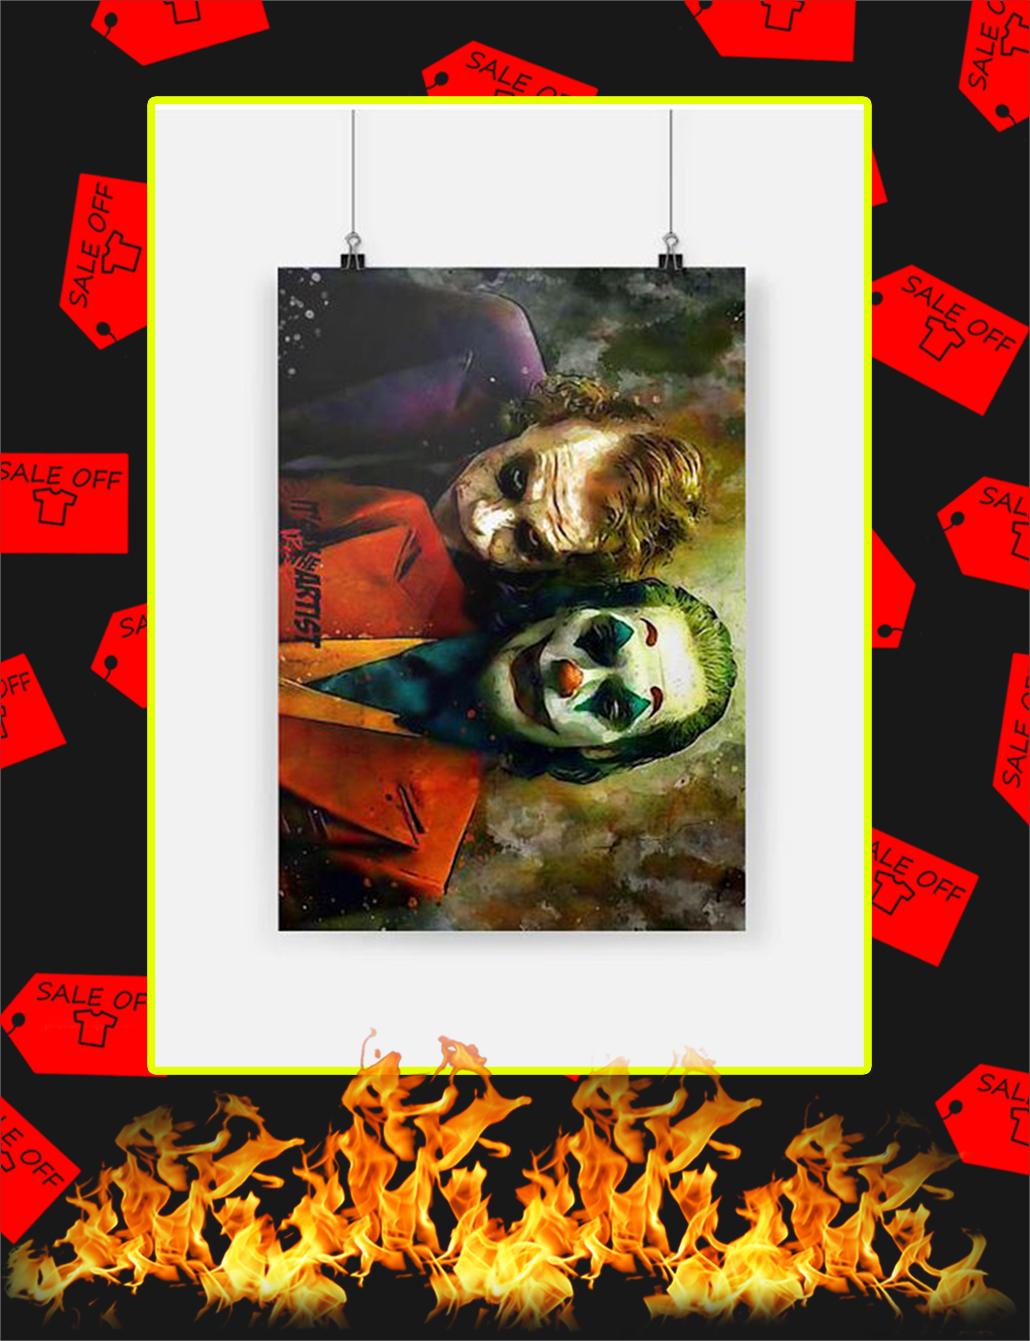 Joker Joaquin Phoenix and Heath Ledger Poster - A3